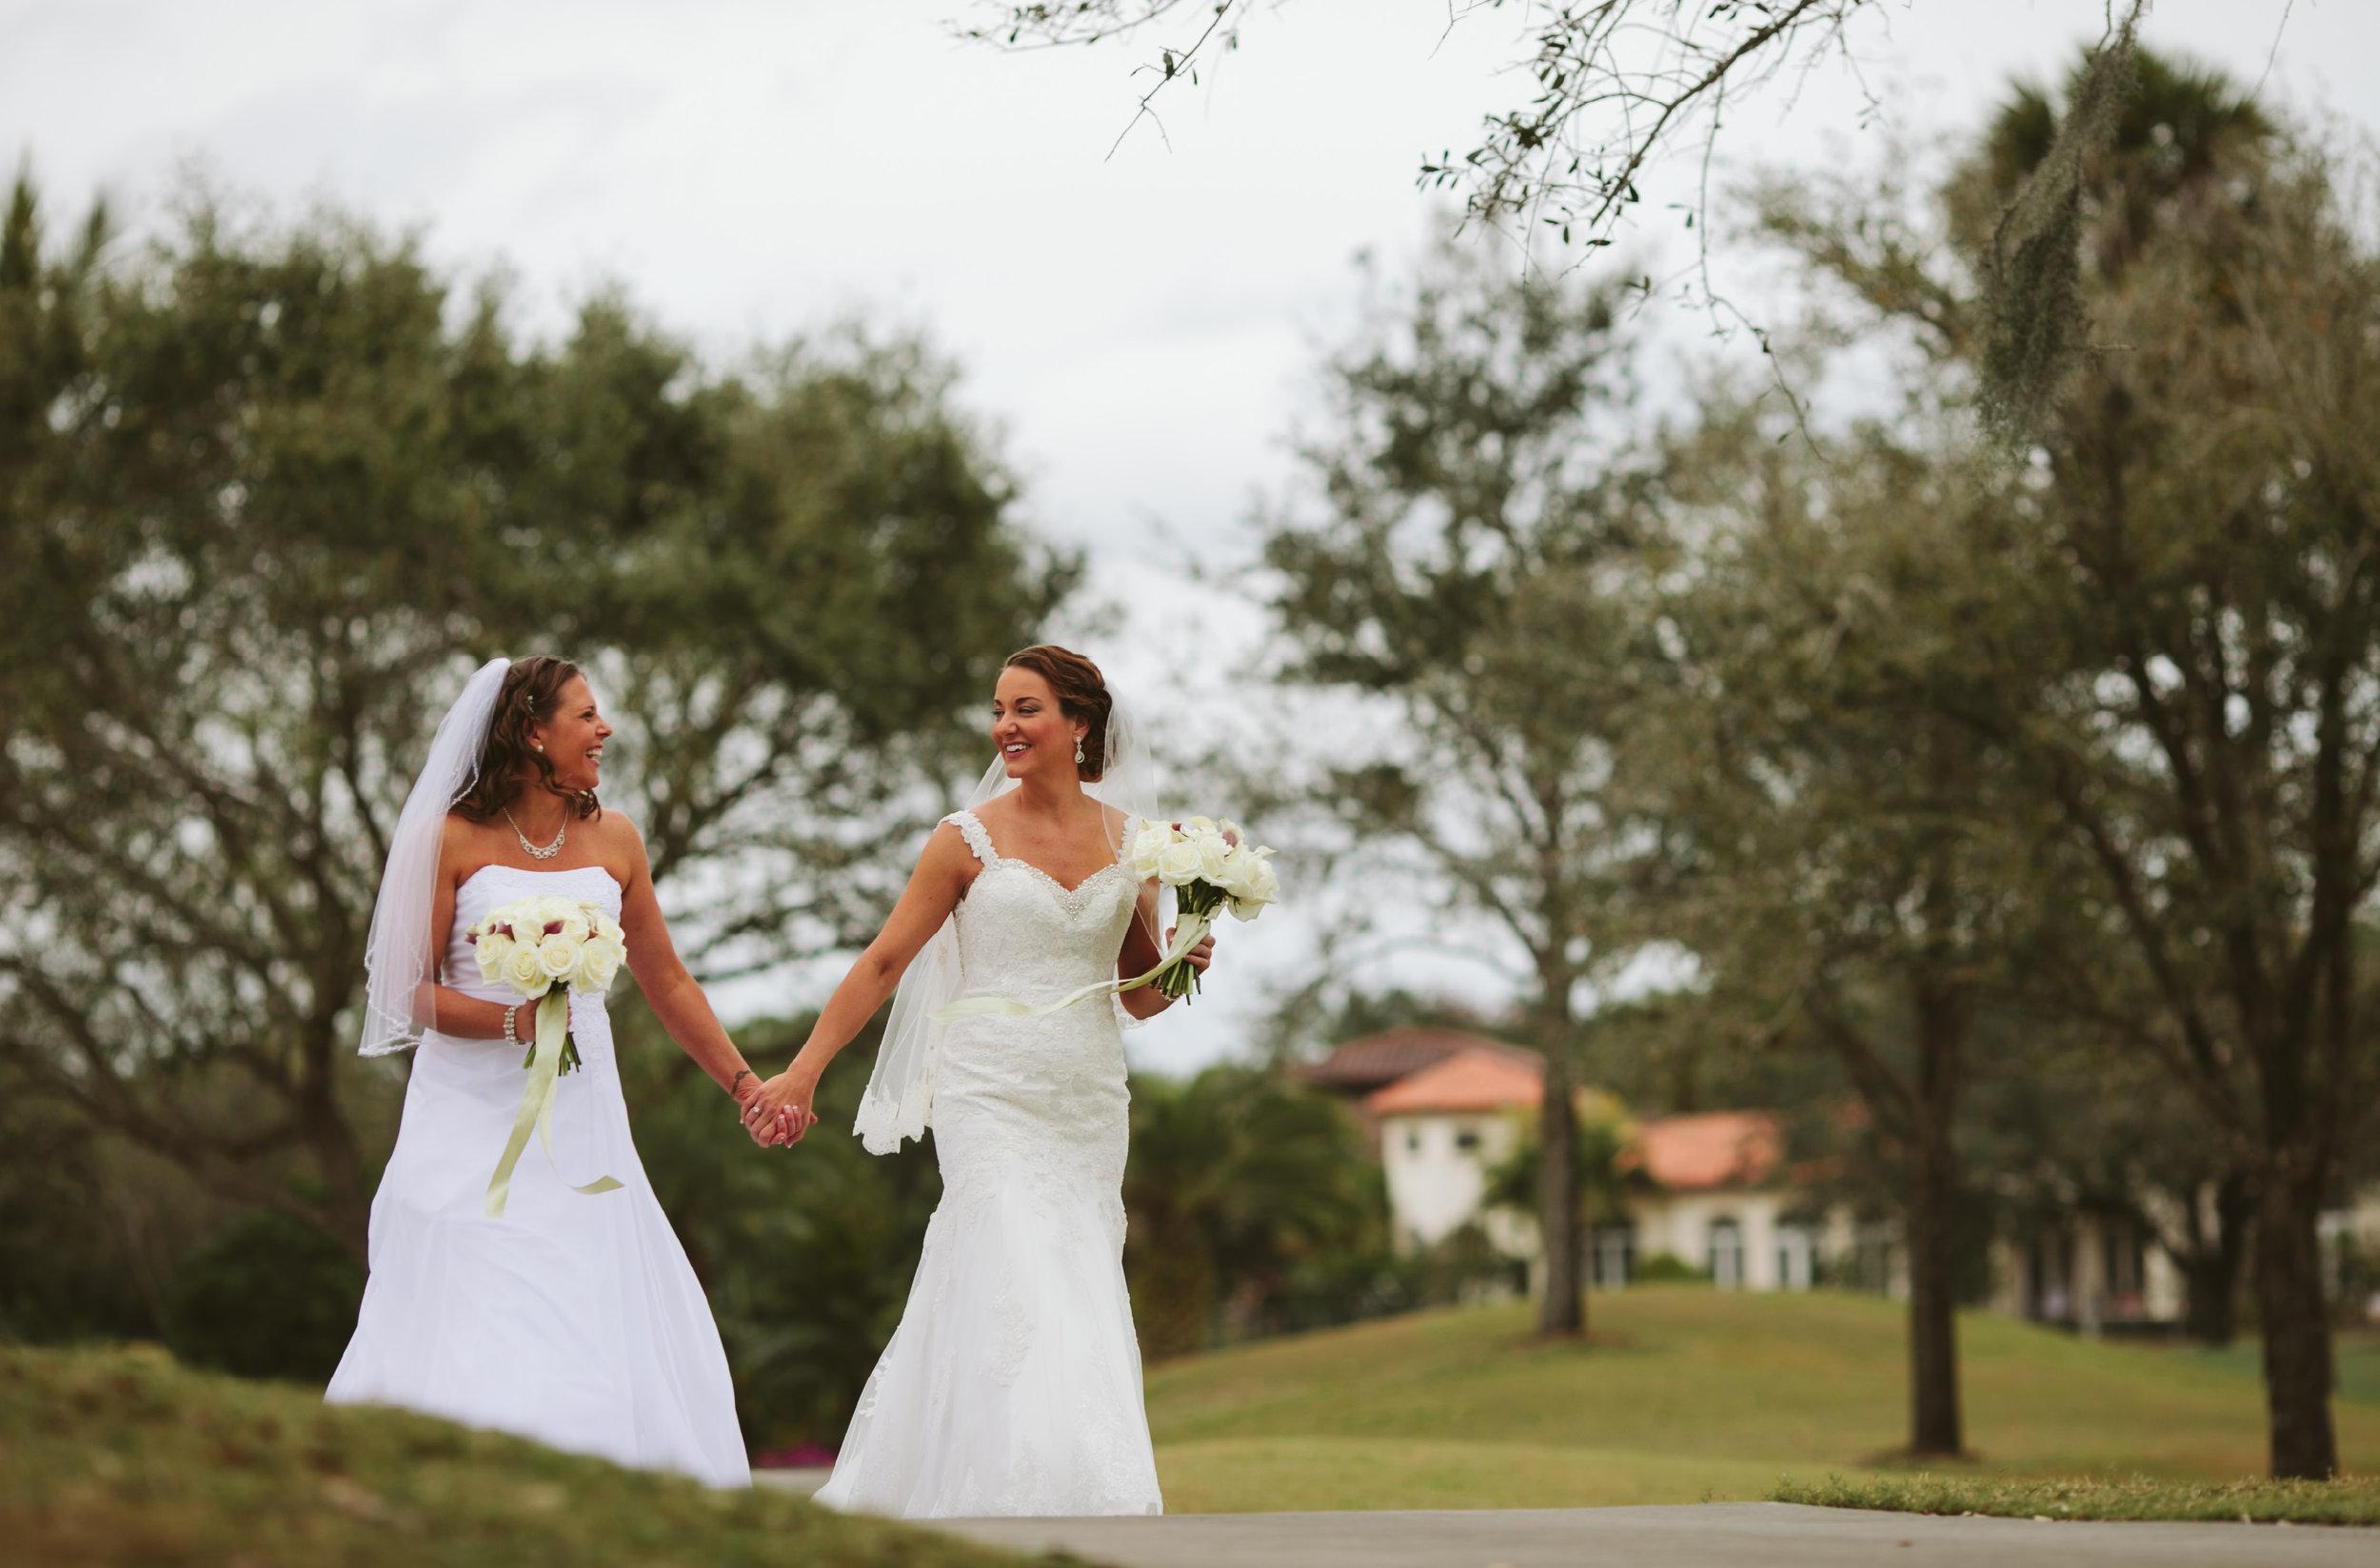 Kim + Monica's Mizner Country Club Wedding in Delray Beach38.jpg